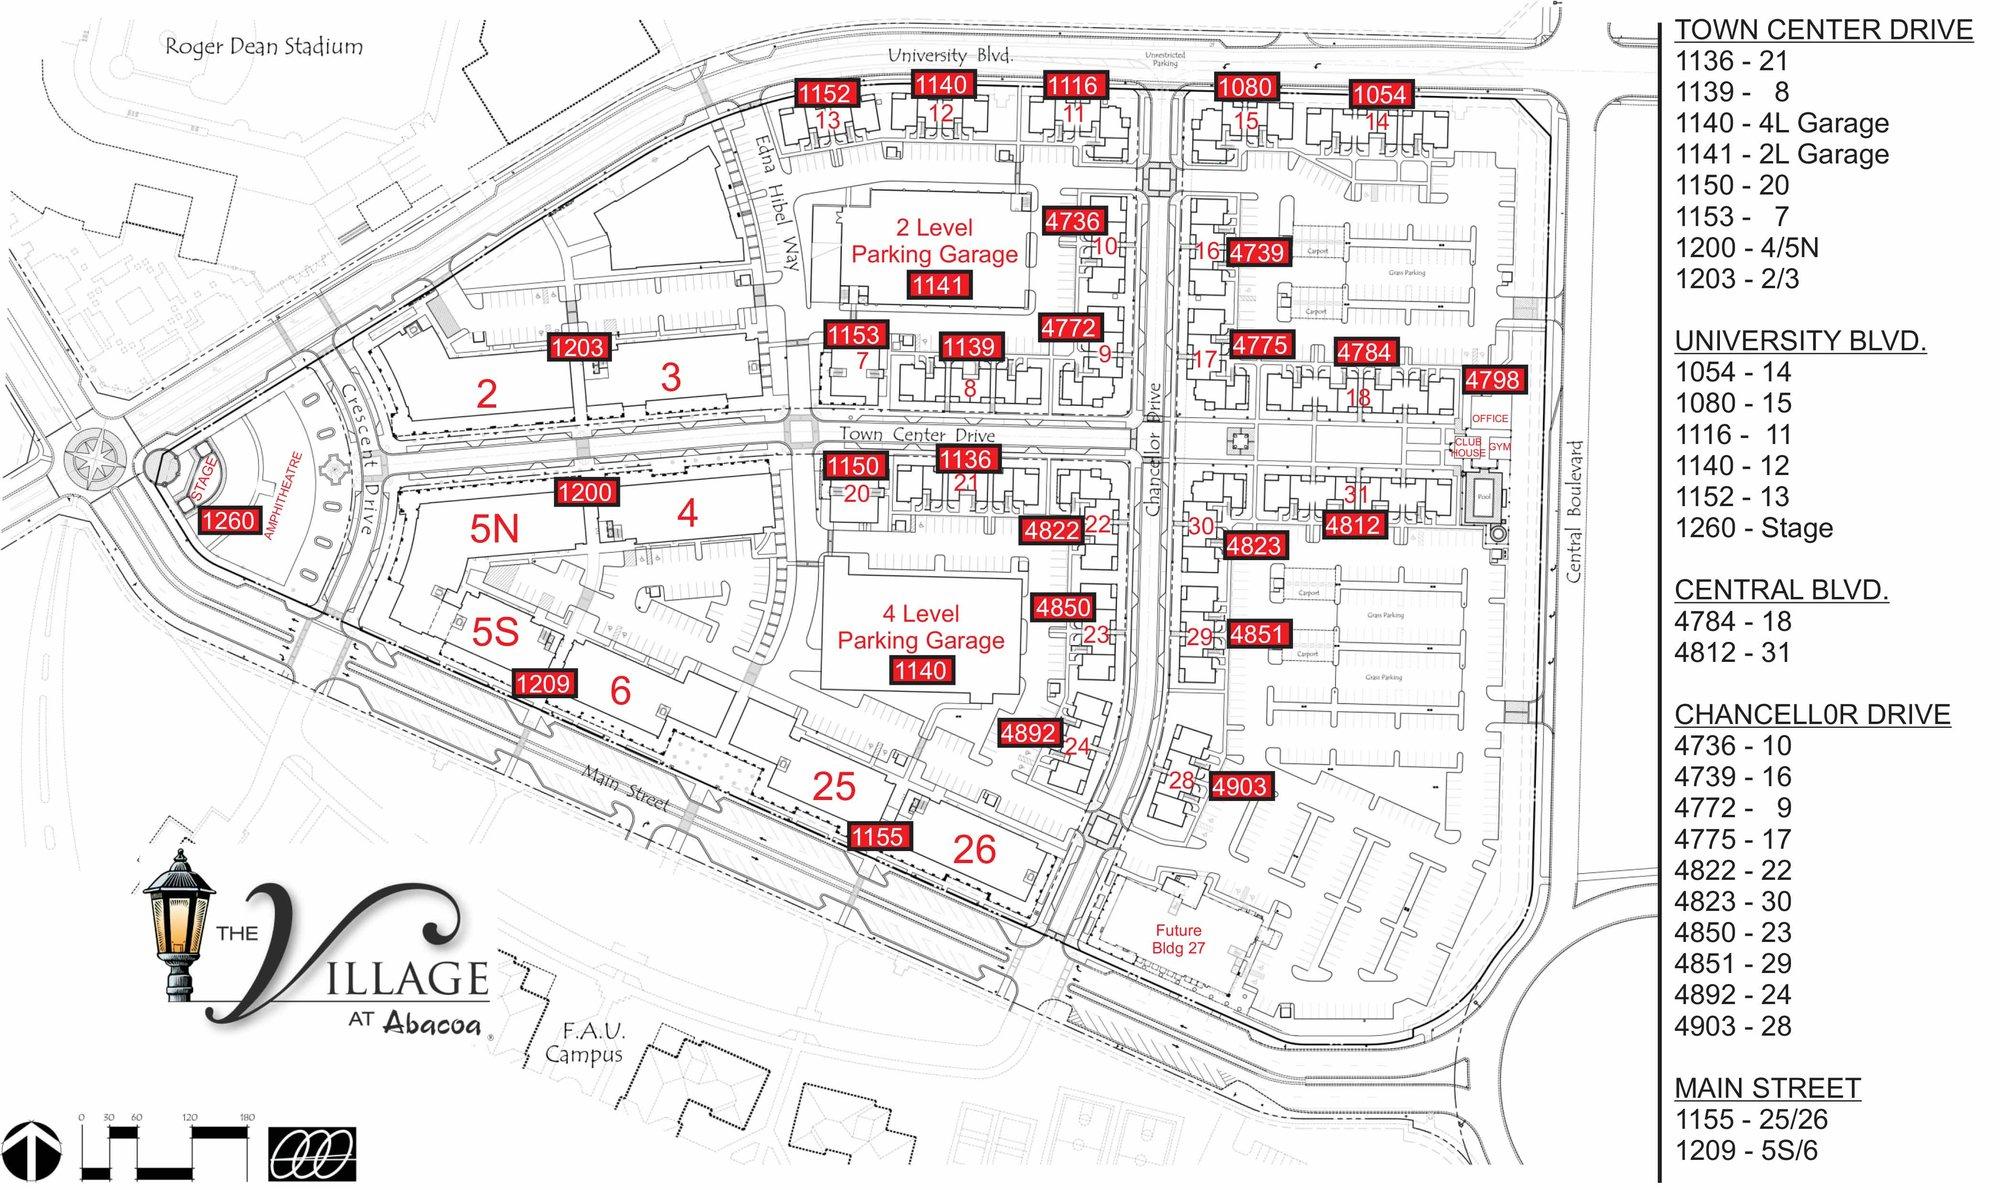 Village At Abacoa Condos, Jupiter, Florida: Abacoa Real Estate - Abacoa Florida Map